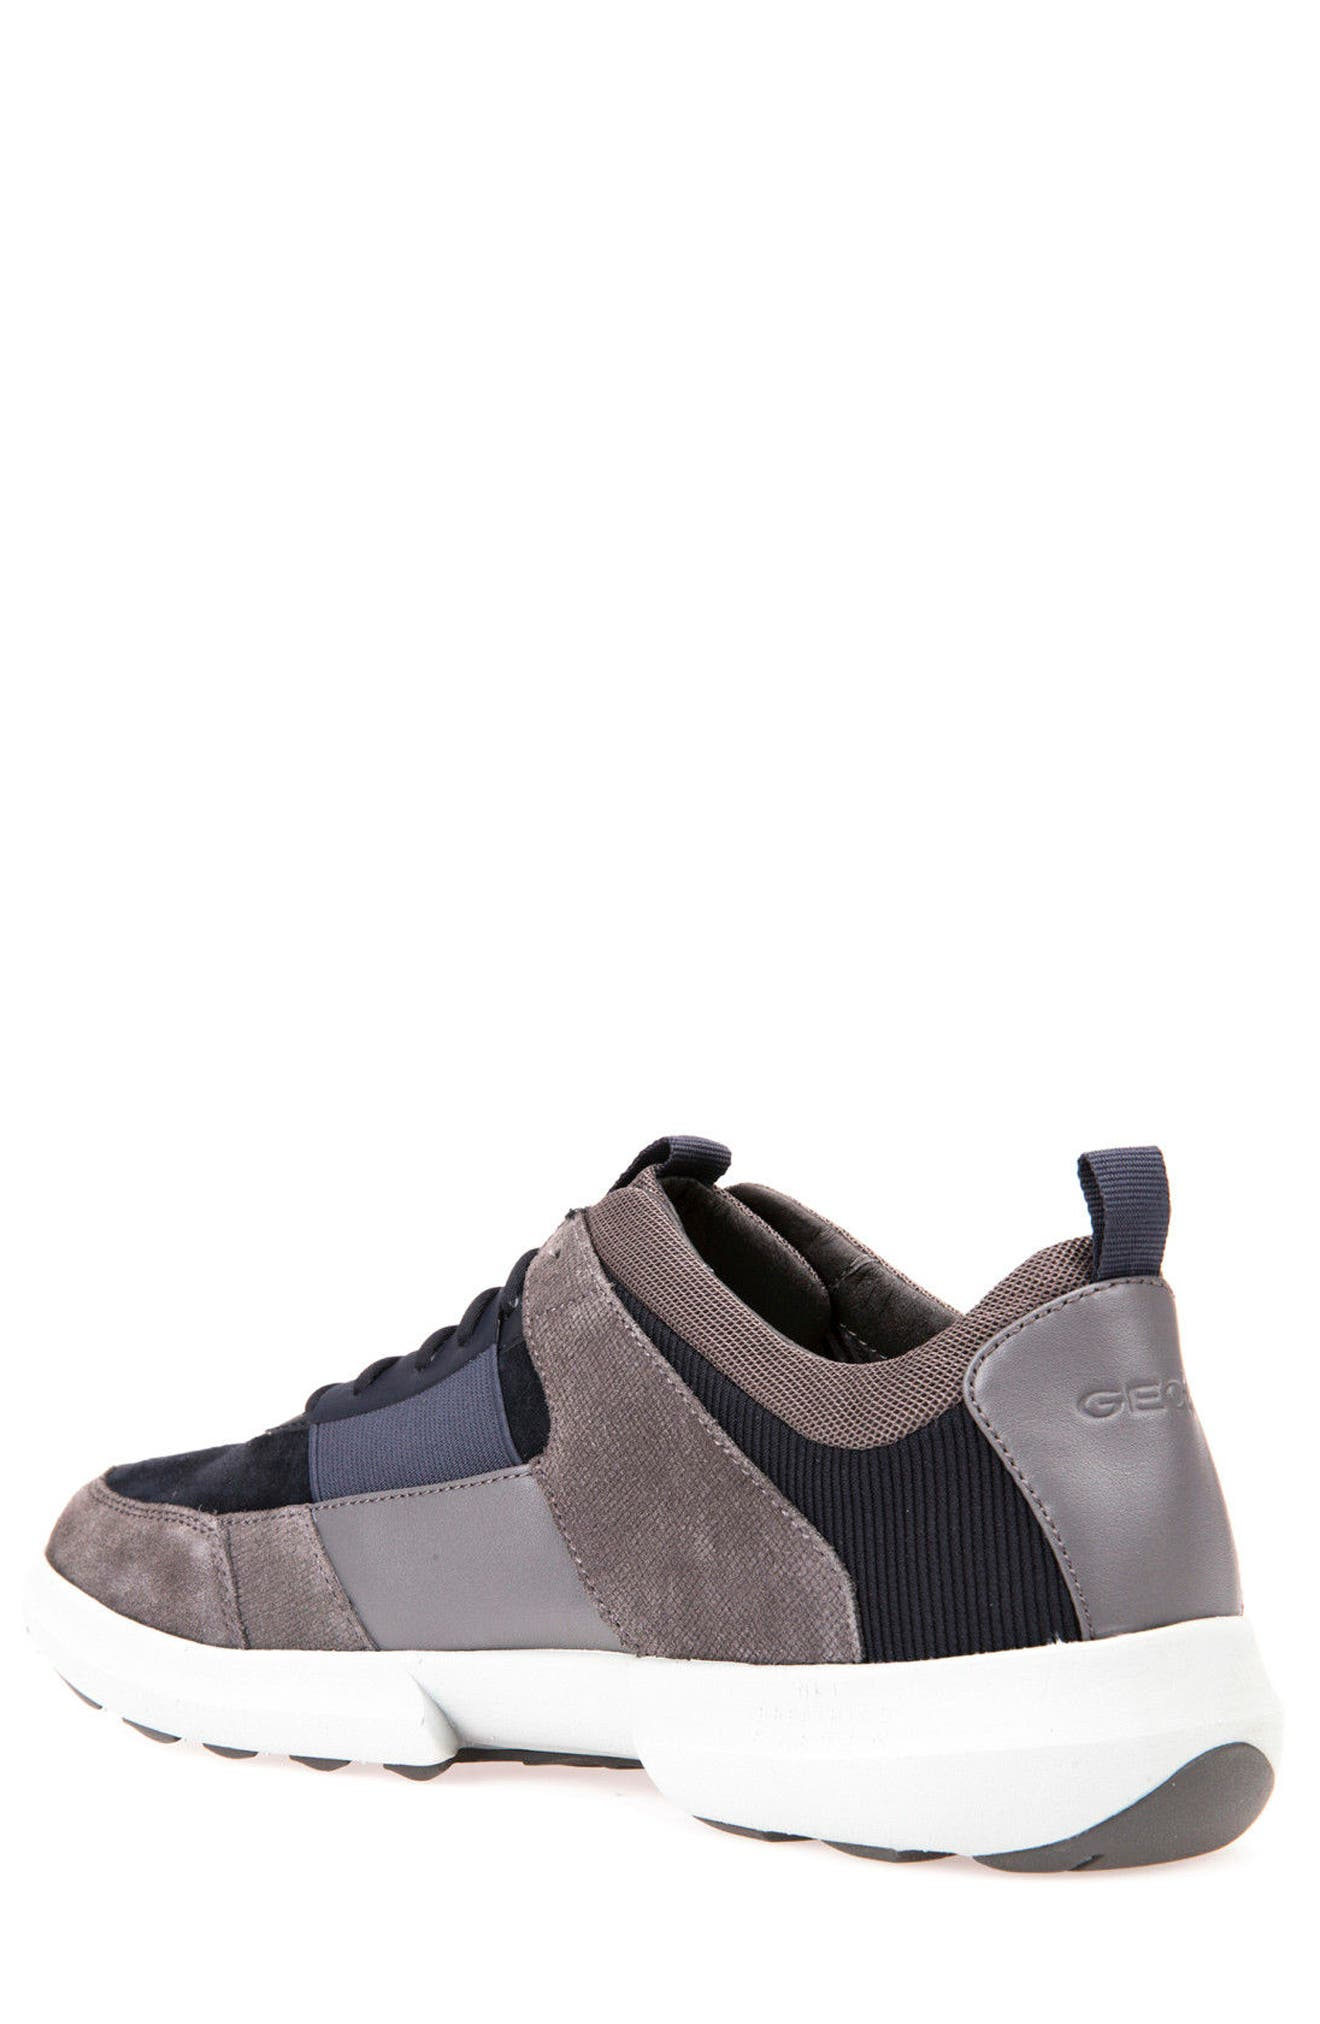 Traccia 5 Sneaker,                             Alternate thumbnail 4, color,